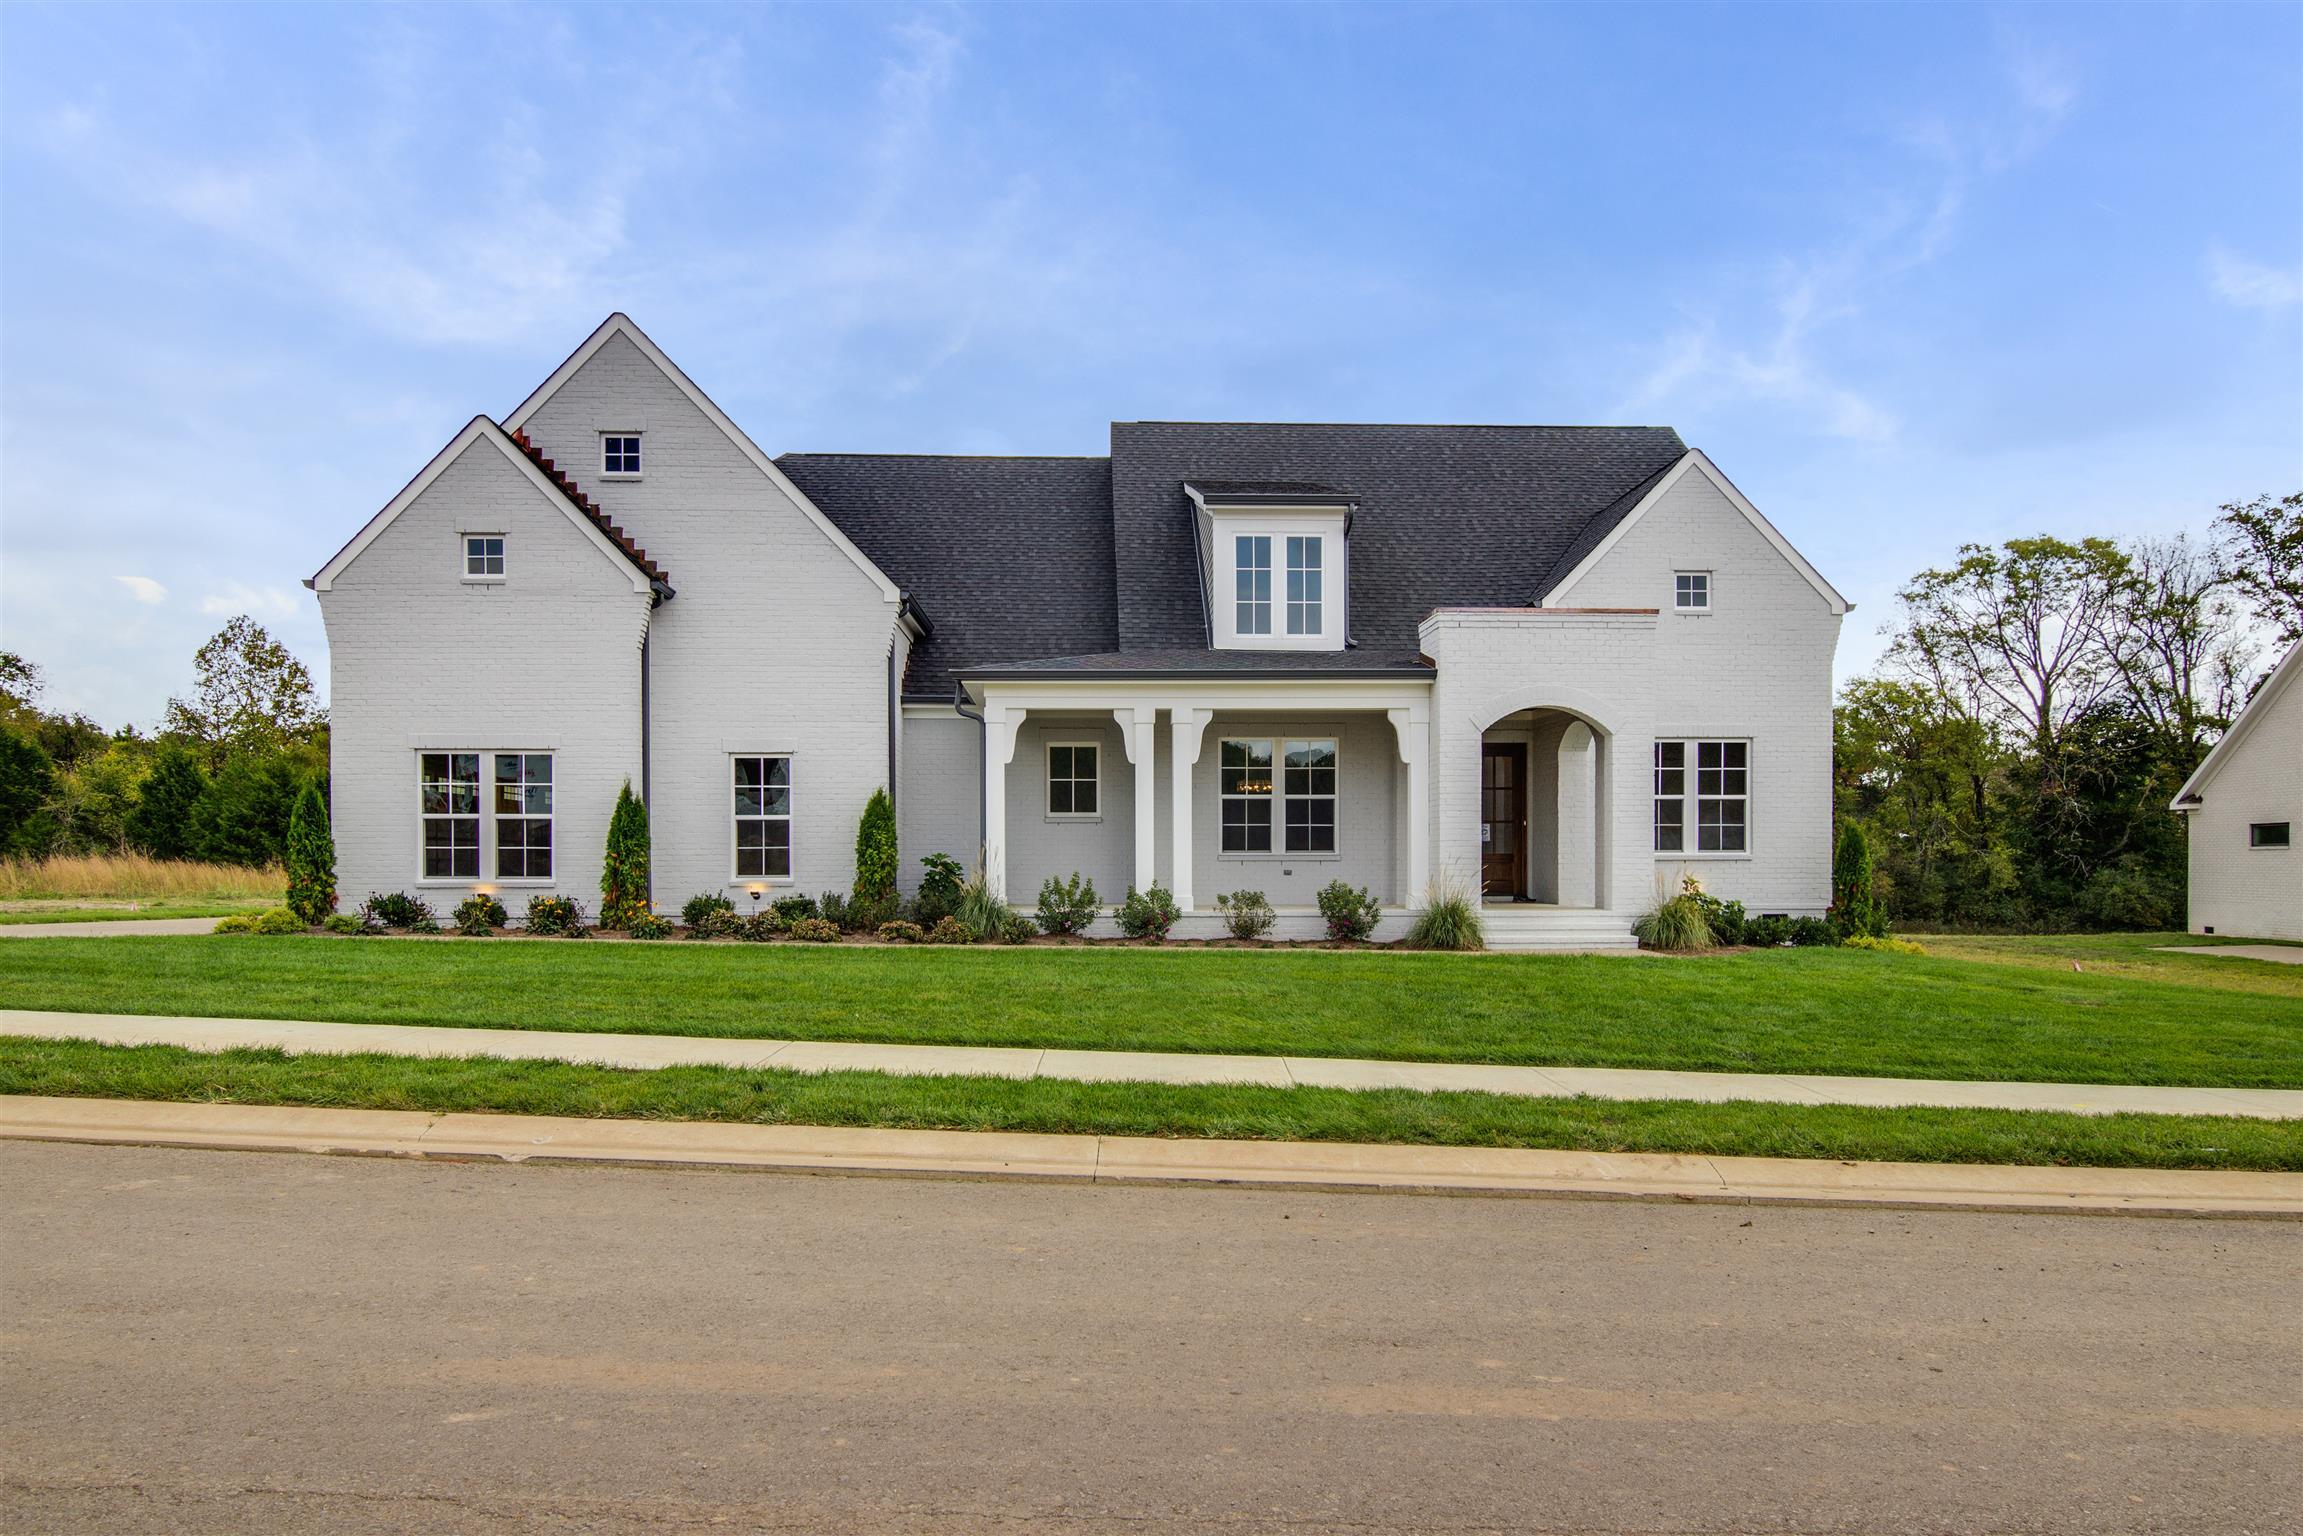 4609 Majestic Meadows Dr LOT823, Arrington, TN 37014 - Arrington, TN real estate listing